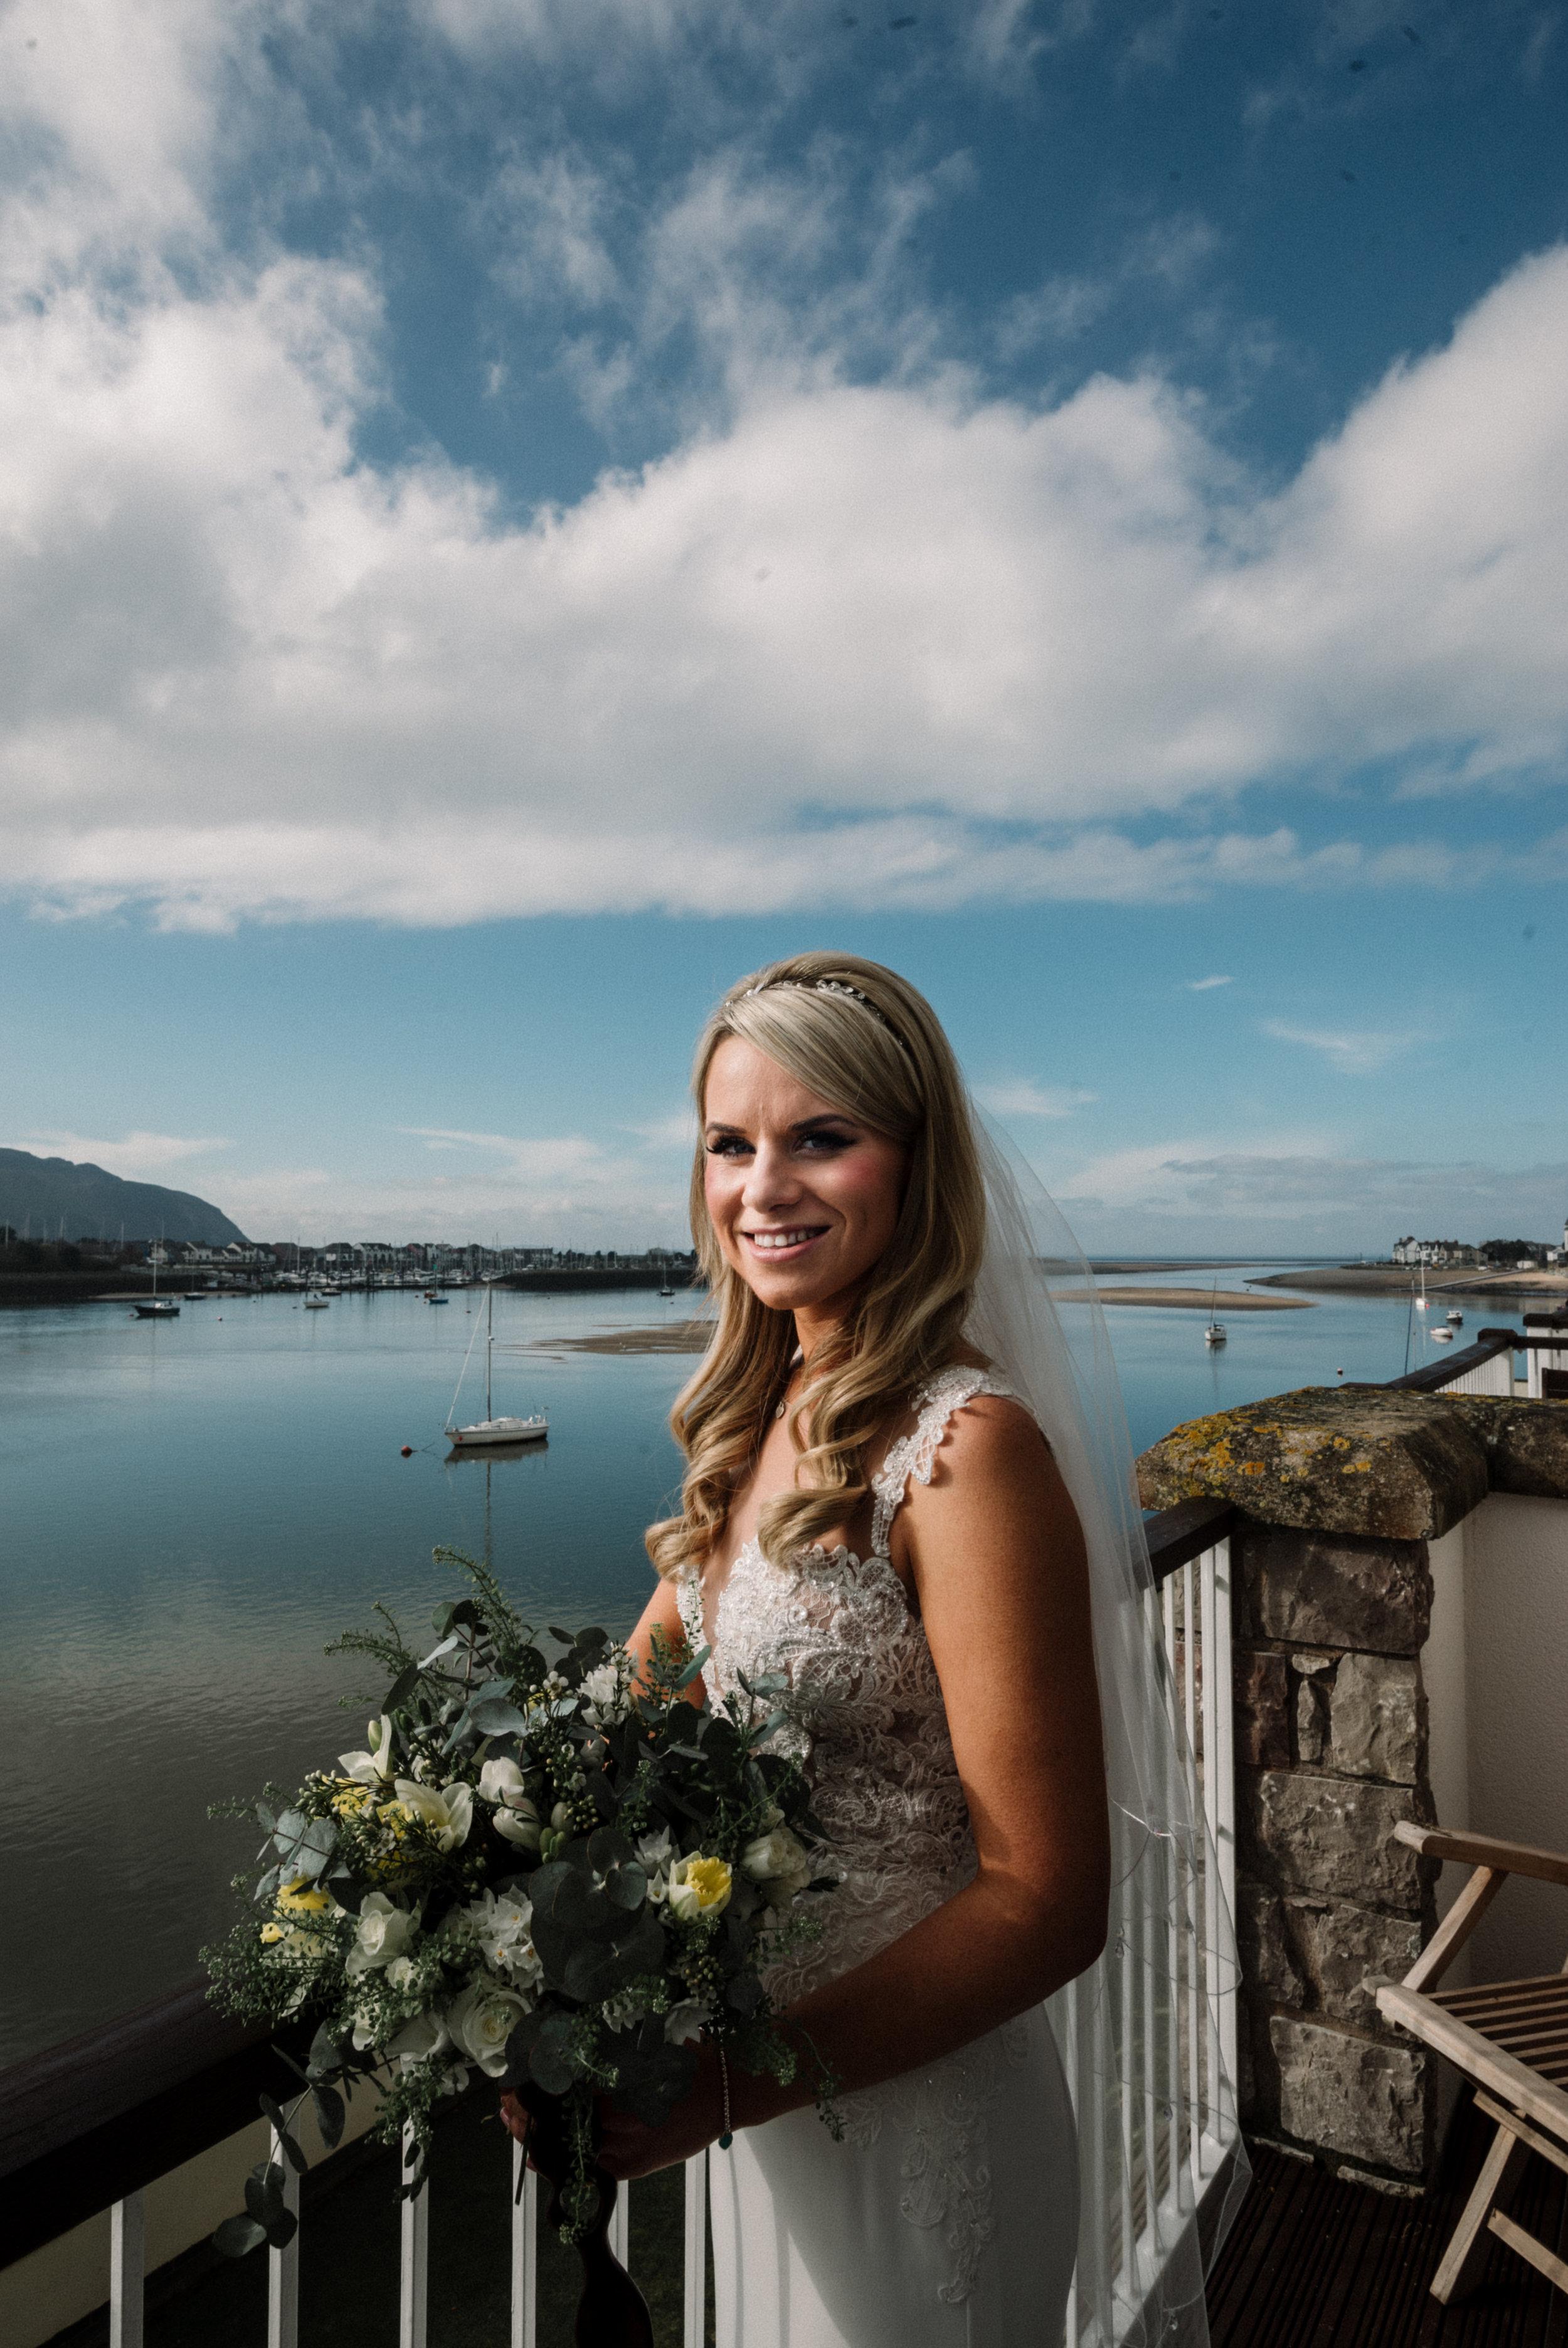 wales-wedding-photographer (16).jpg